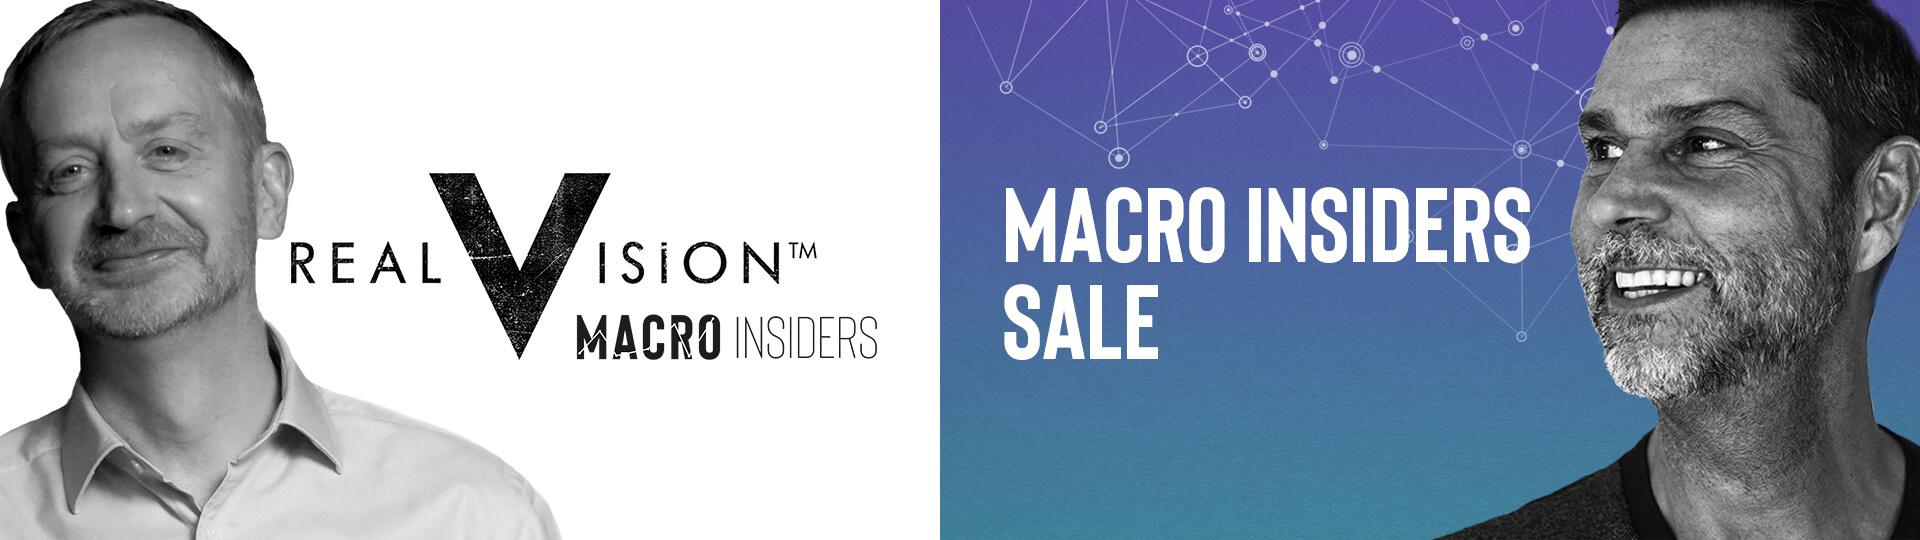 Macro Insiders Sale